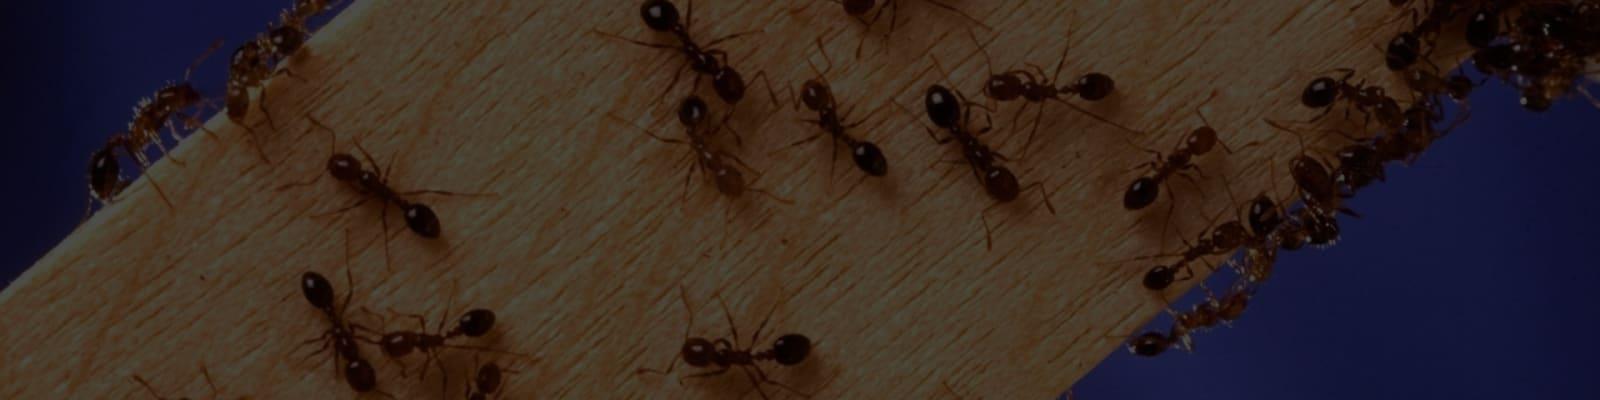 pest controls in Johannesburg